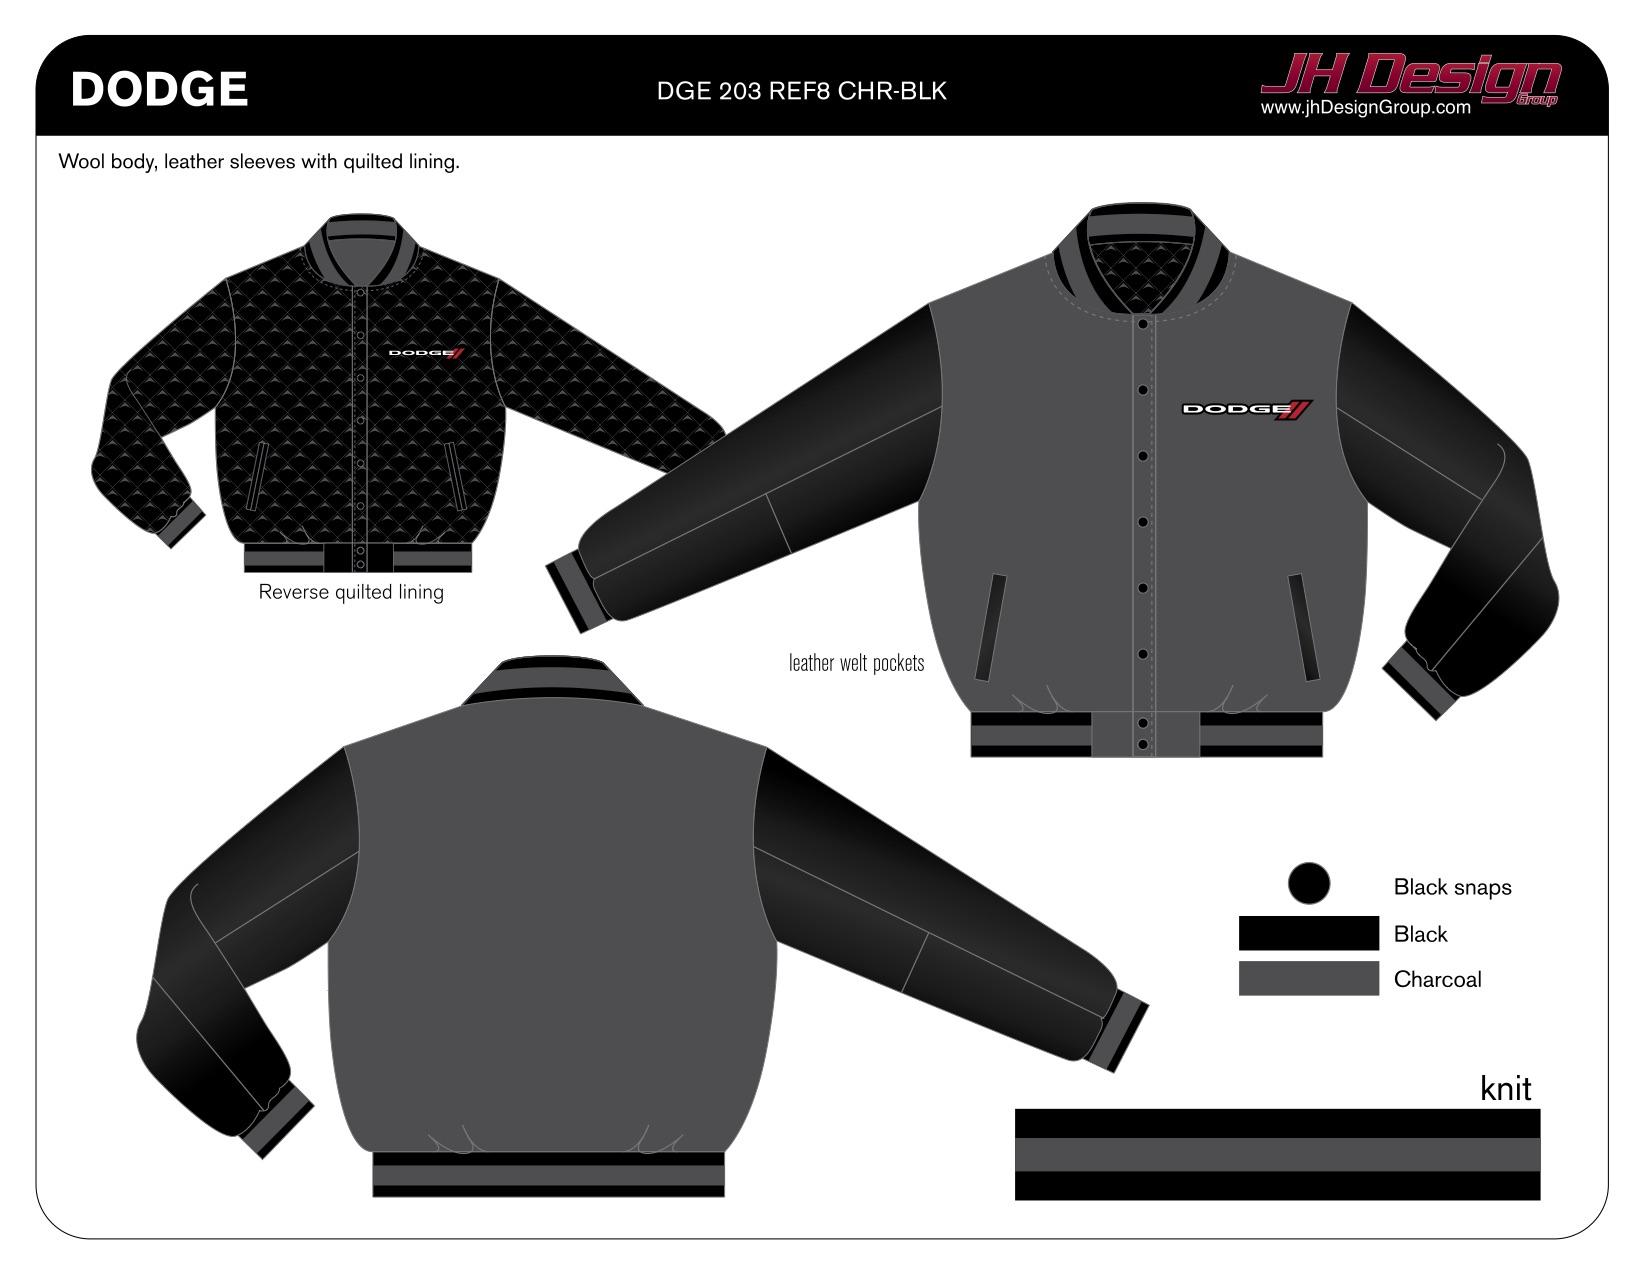 DGE 203 REF8 CHR-BLK